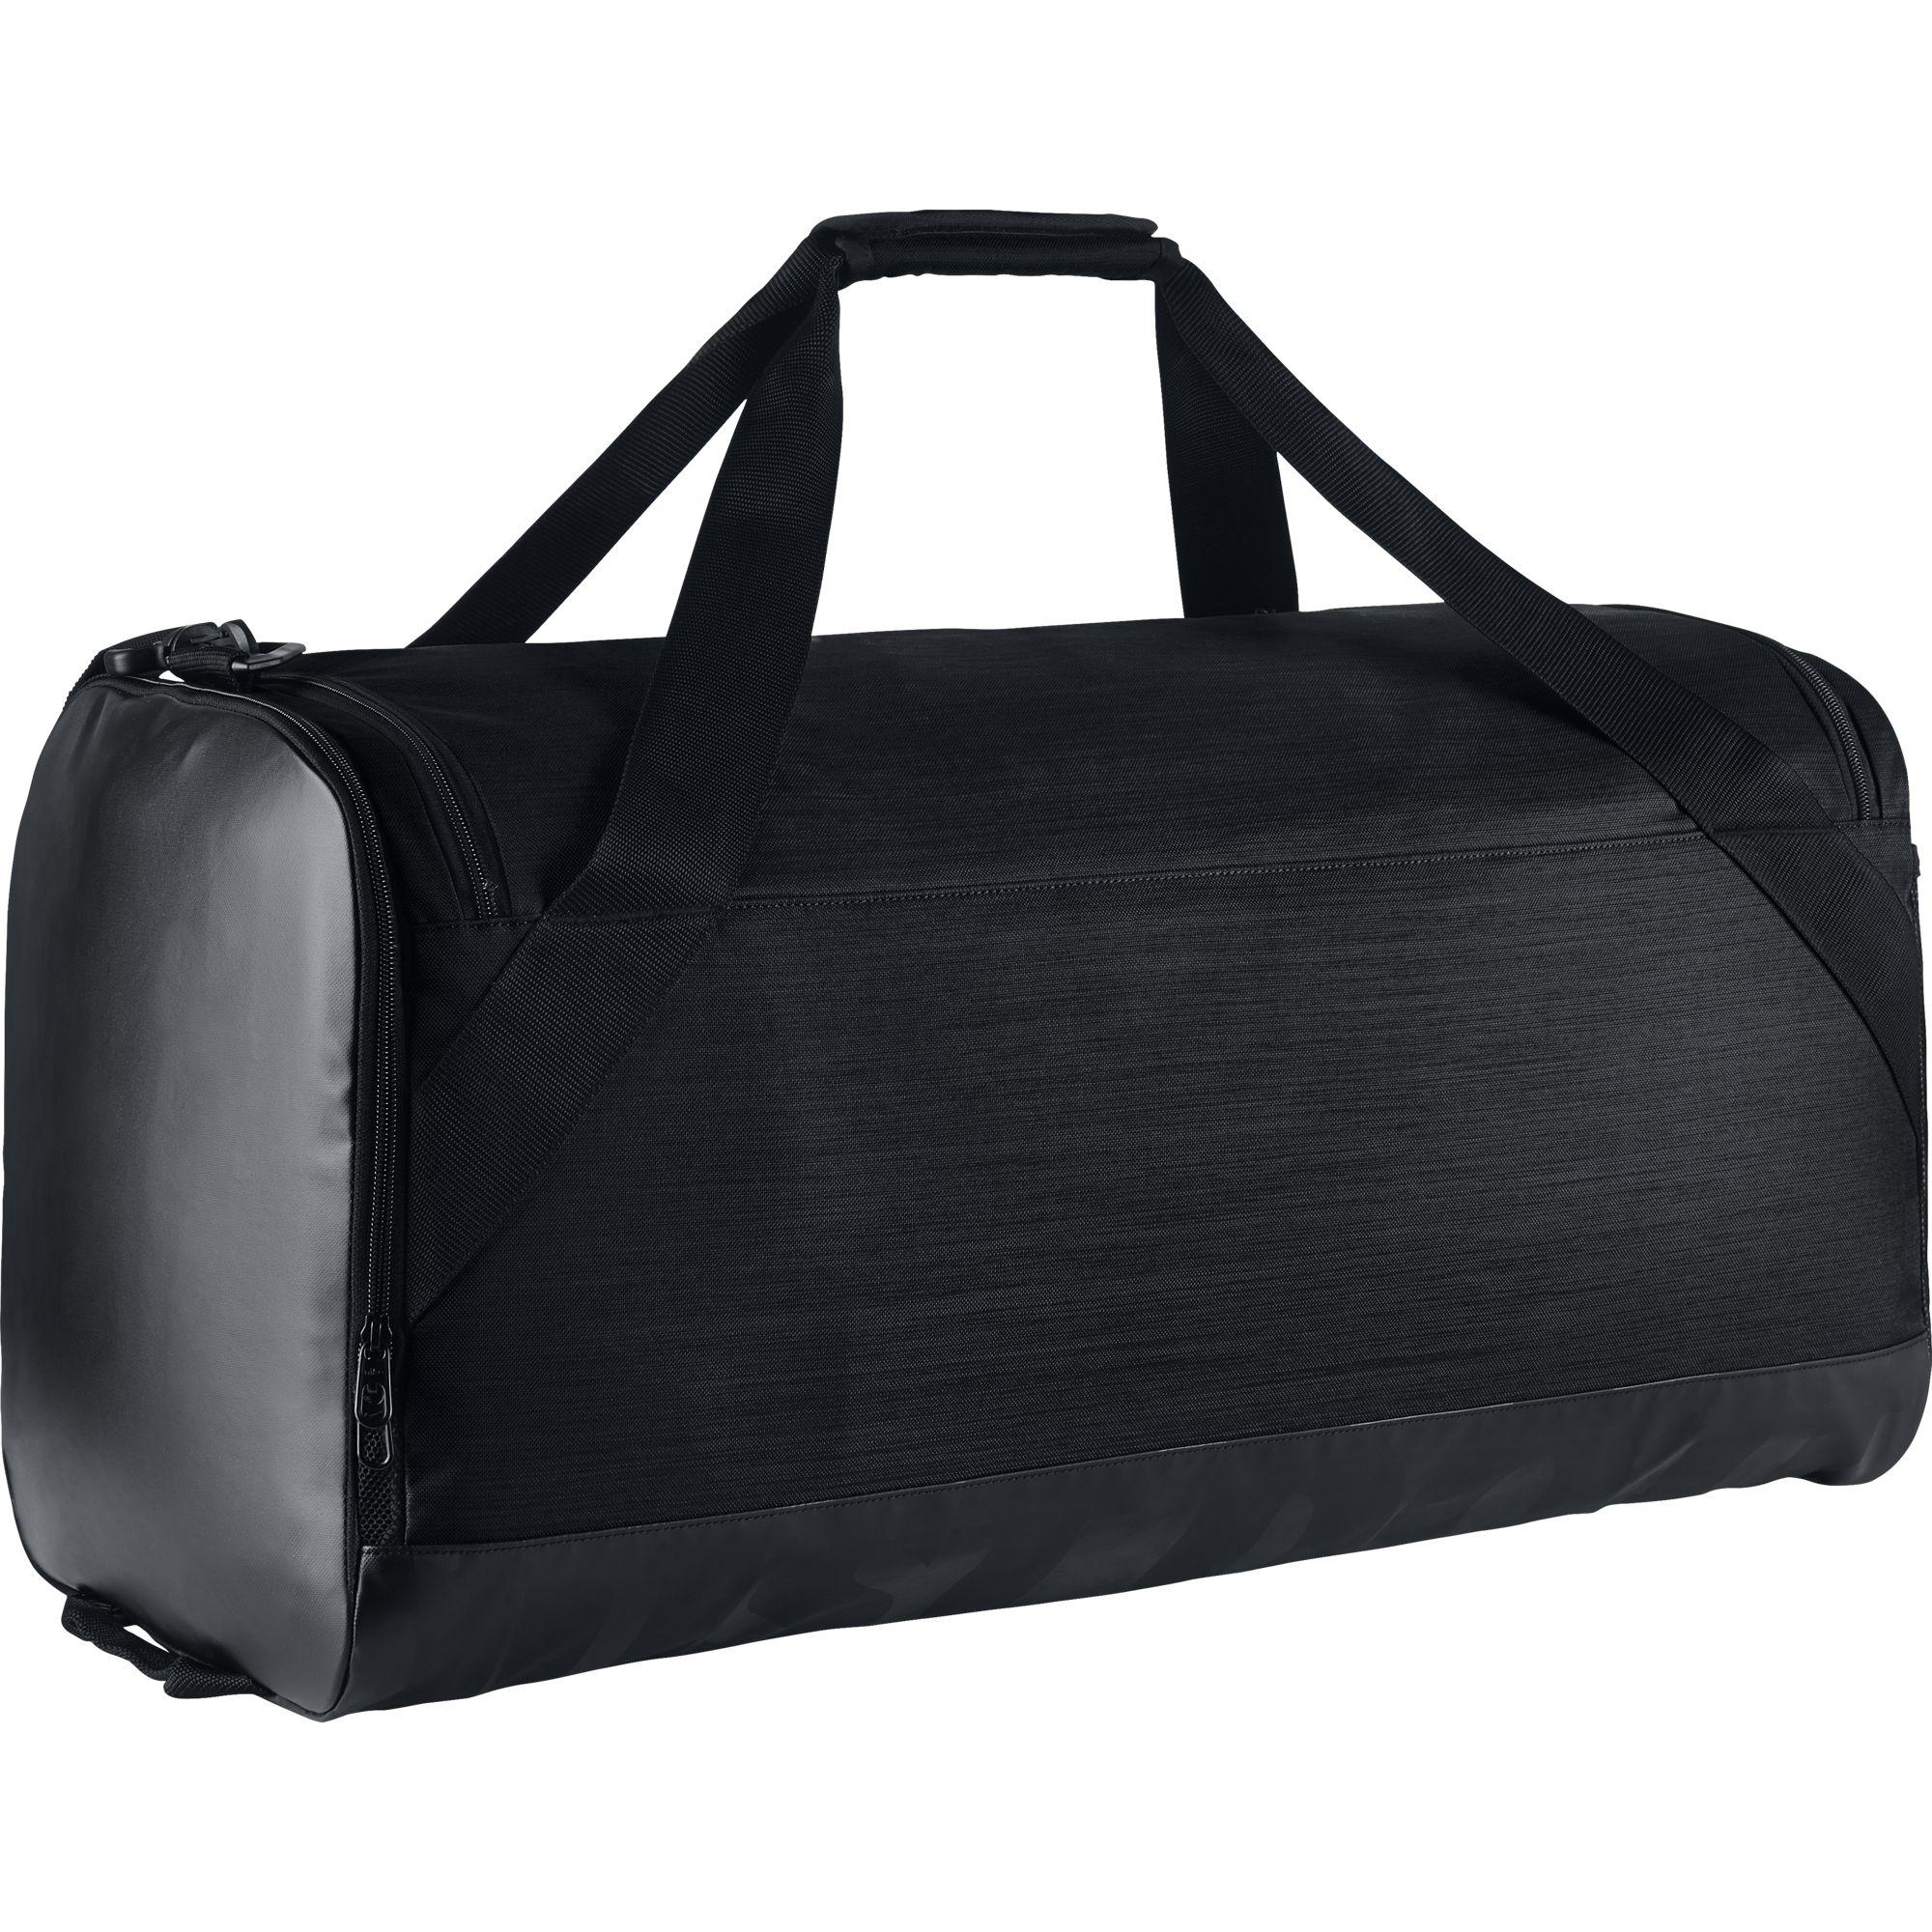 744d3636f4e1e ... torba Nike Brasilia (Large) Training Duffel Bag BA5333 010 ...